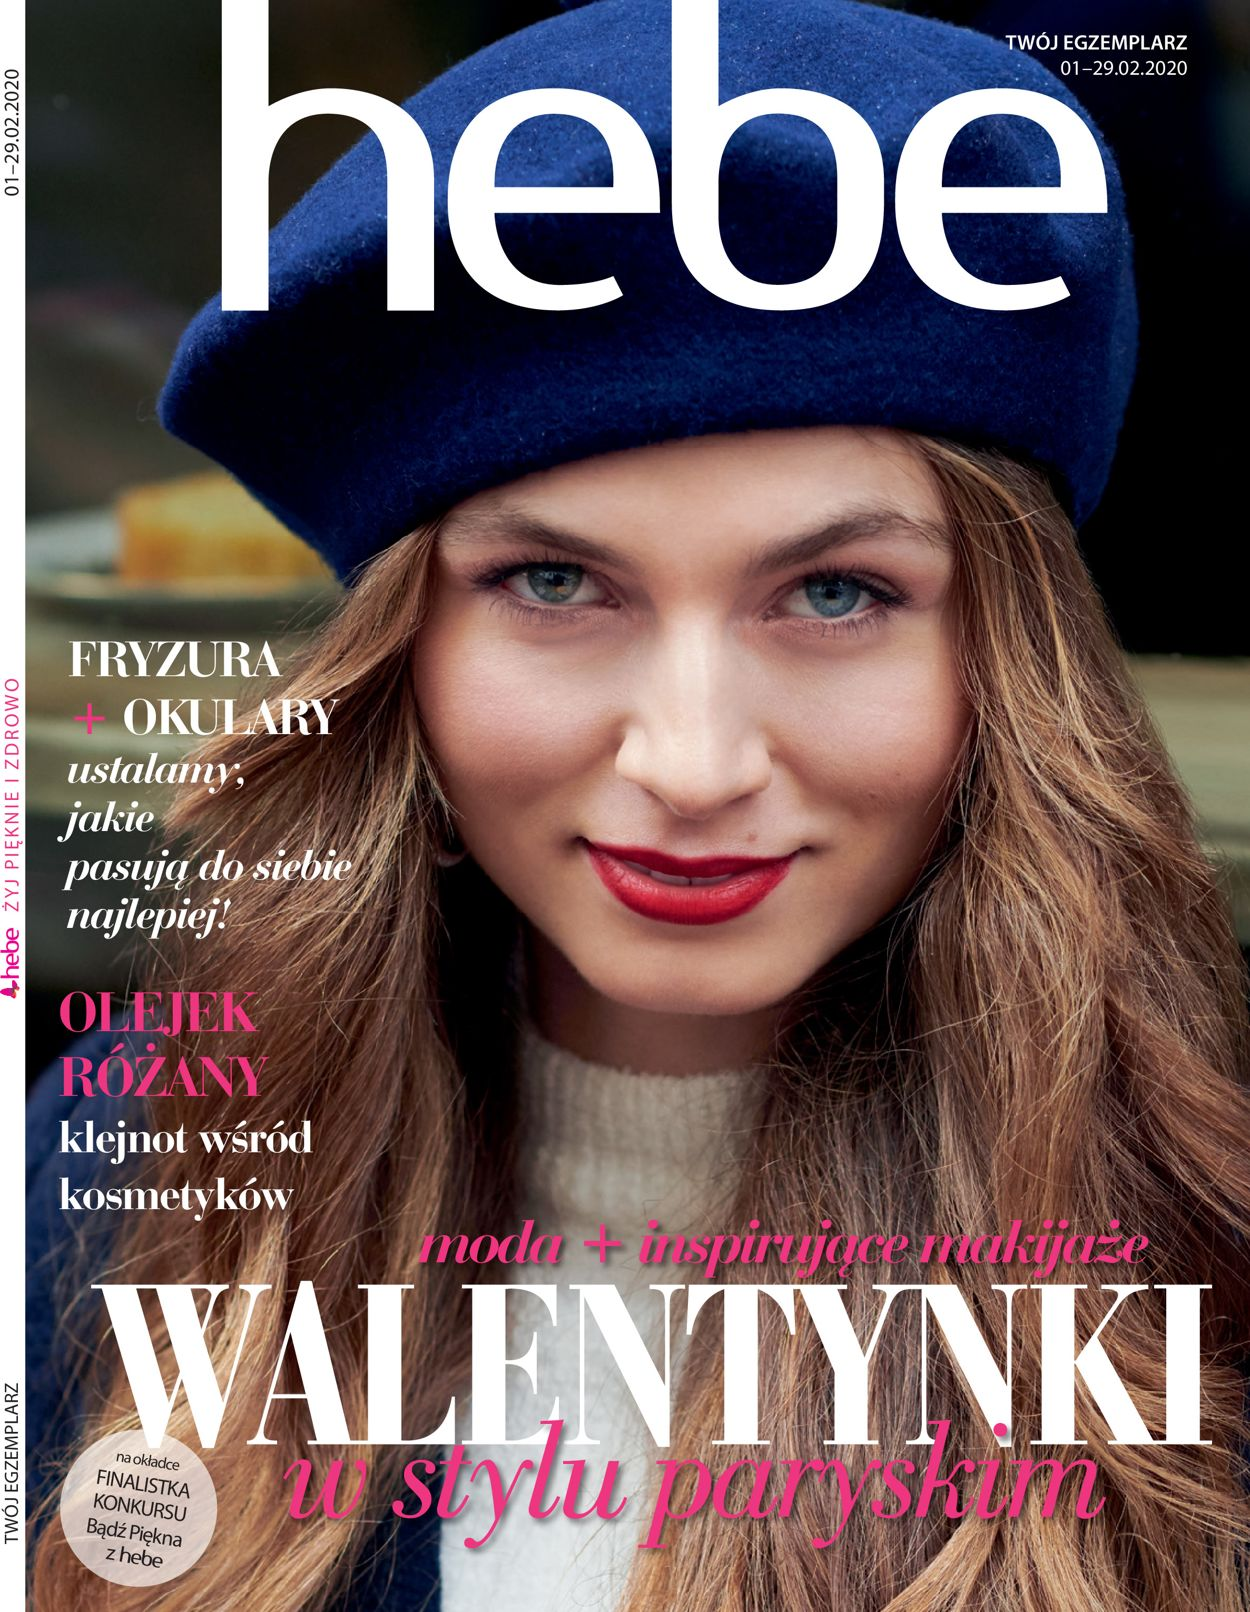 Gazetka promocyjna Hebe - 01.02-29.02.2020